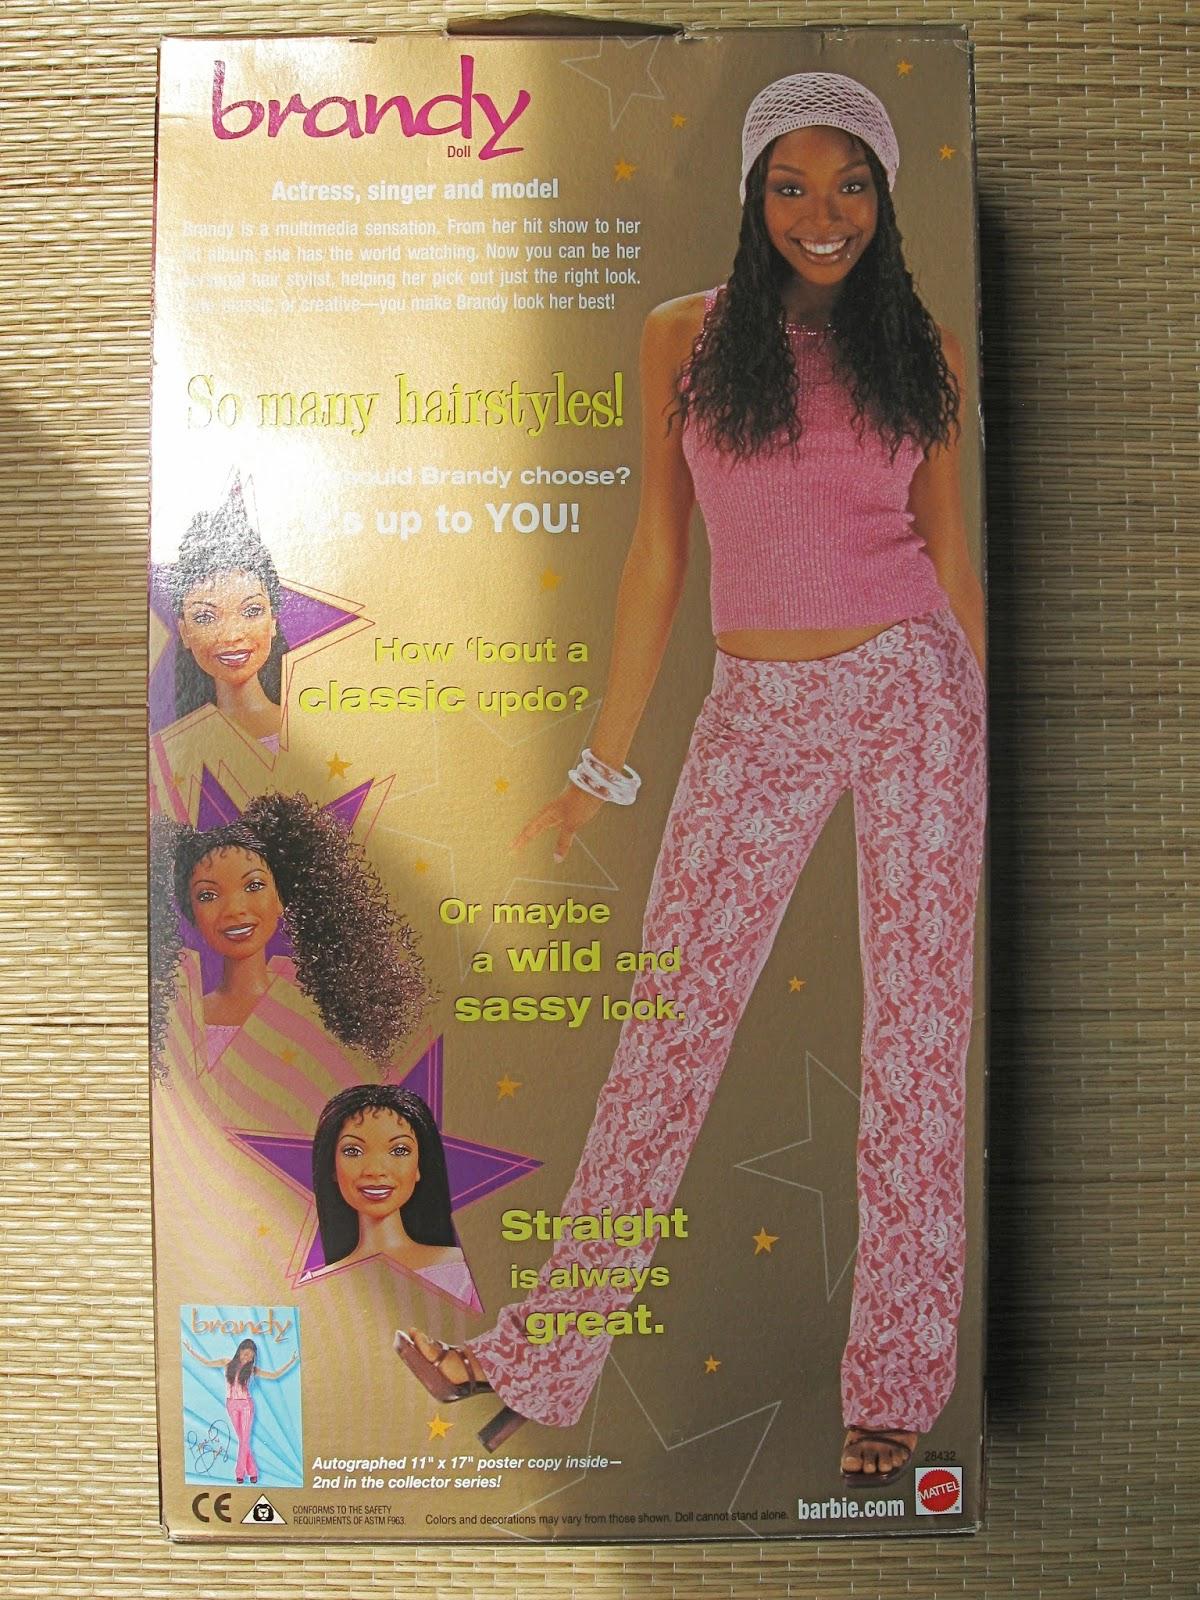 Tremendous Dolces Closet Barbie Stylin Hair Brandy Short Hairstyles Gunalazisus